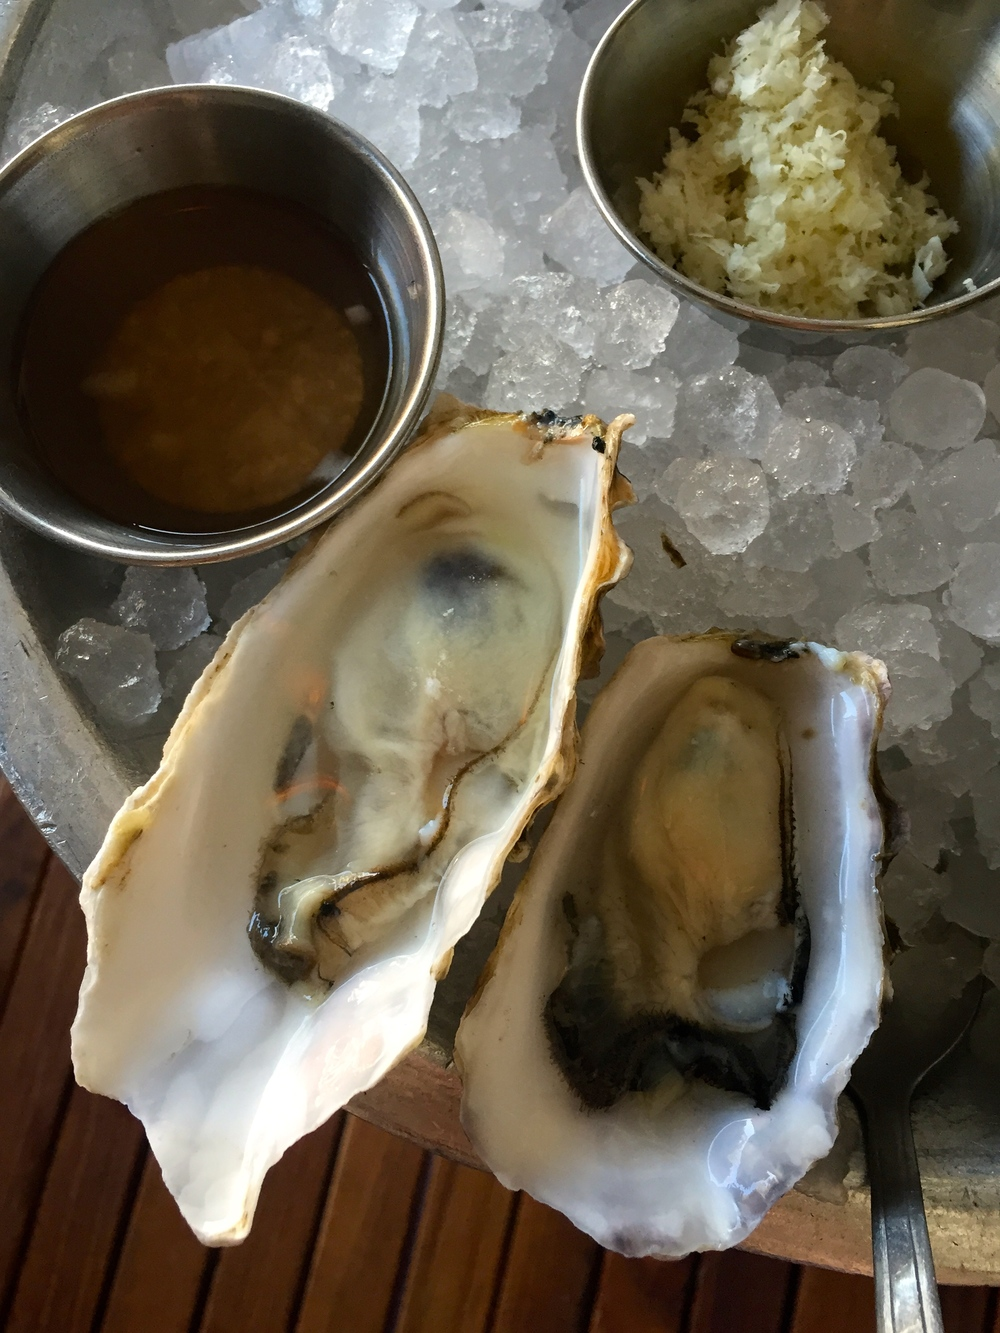 Arcadia Point Oysters, Hammersley, WA